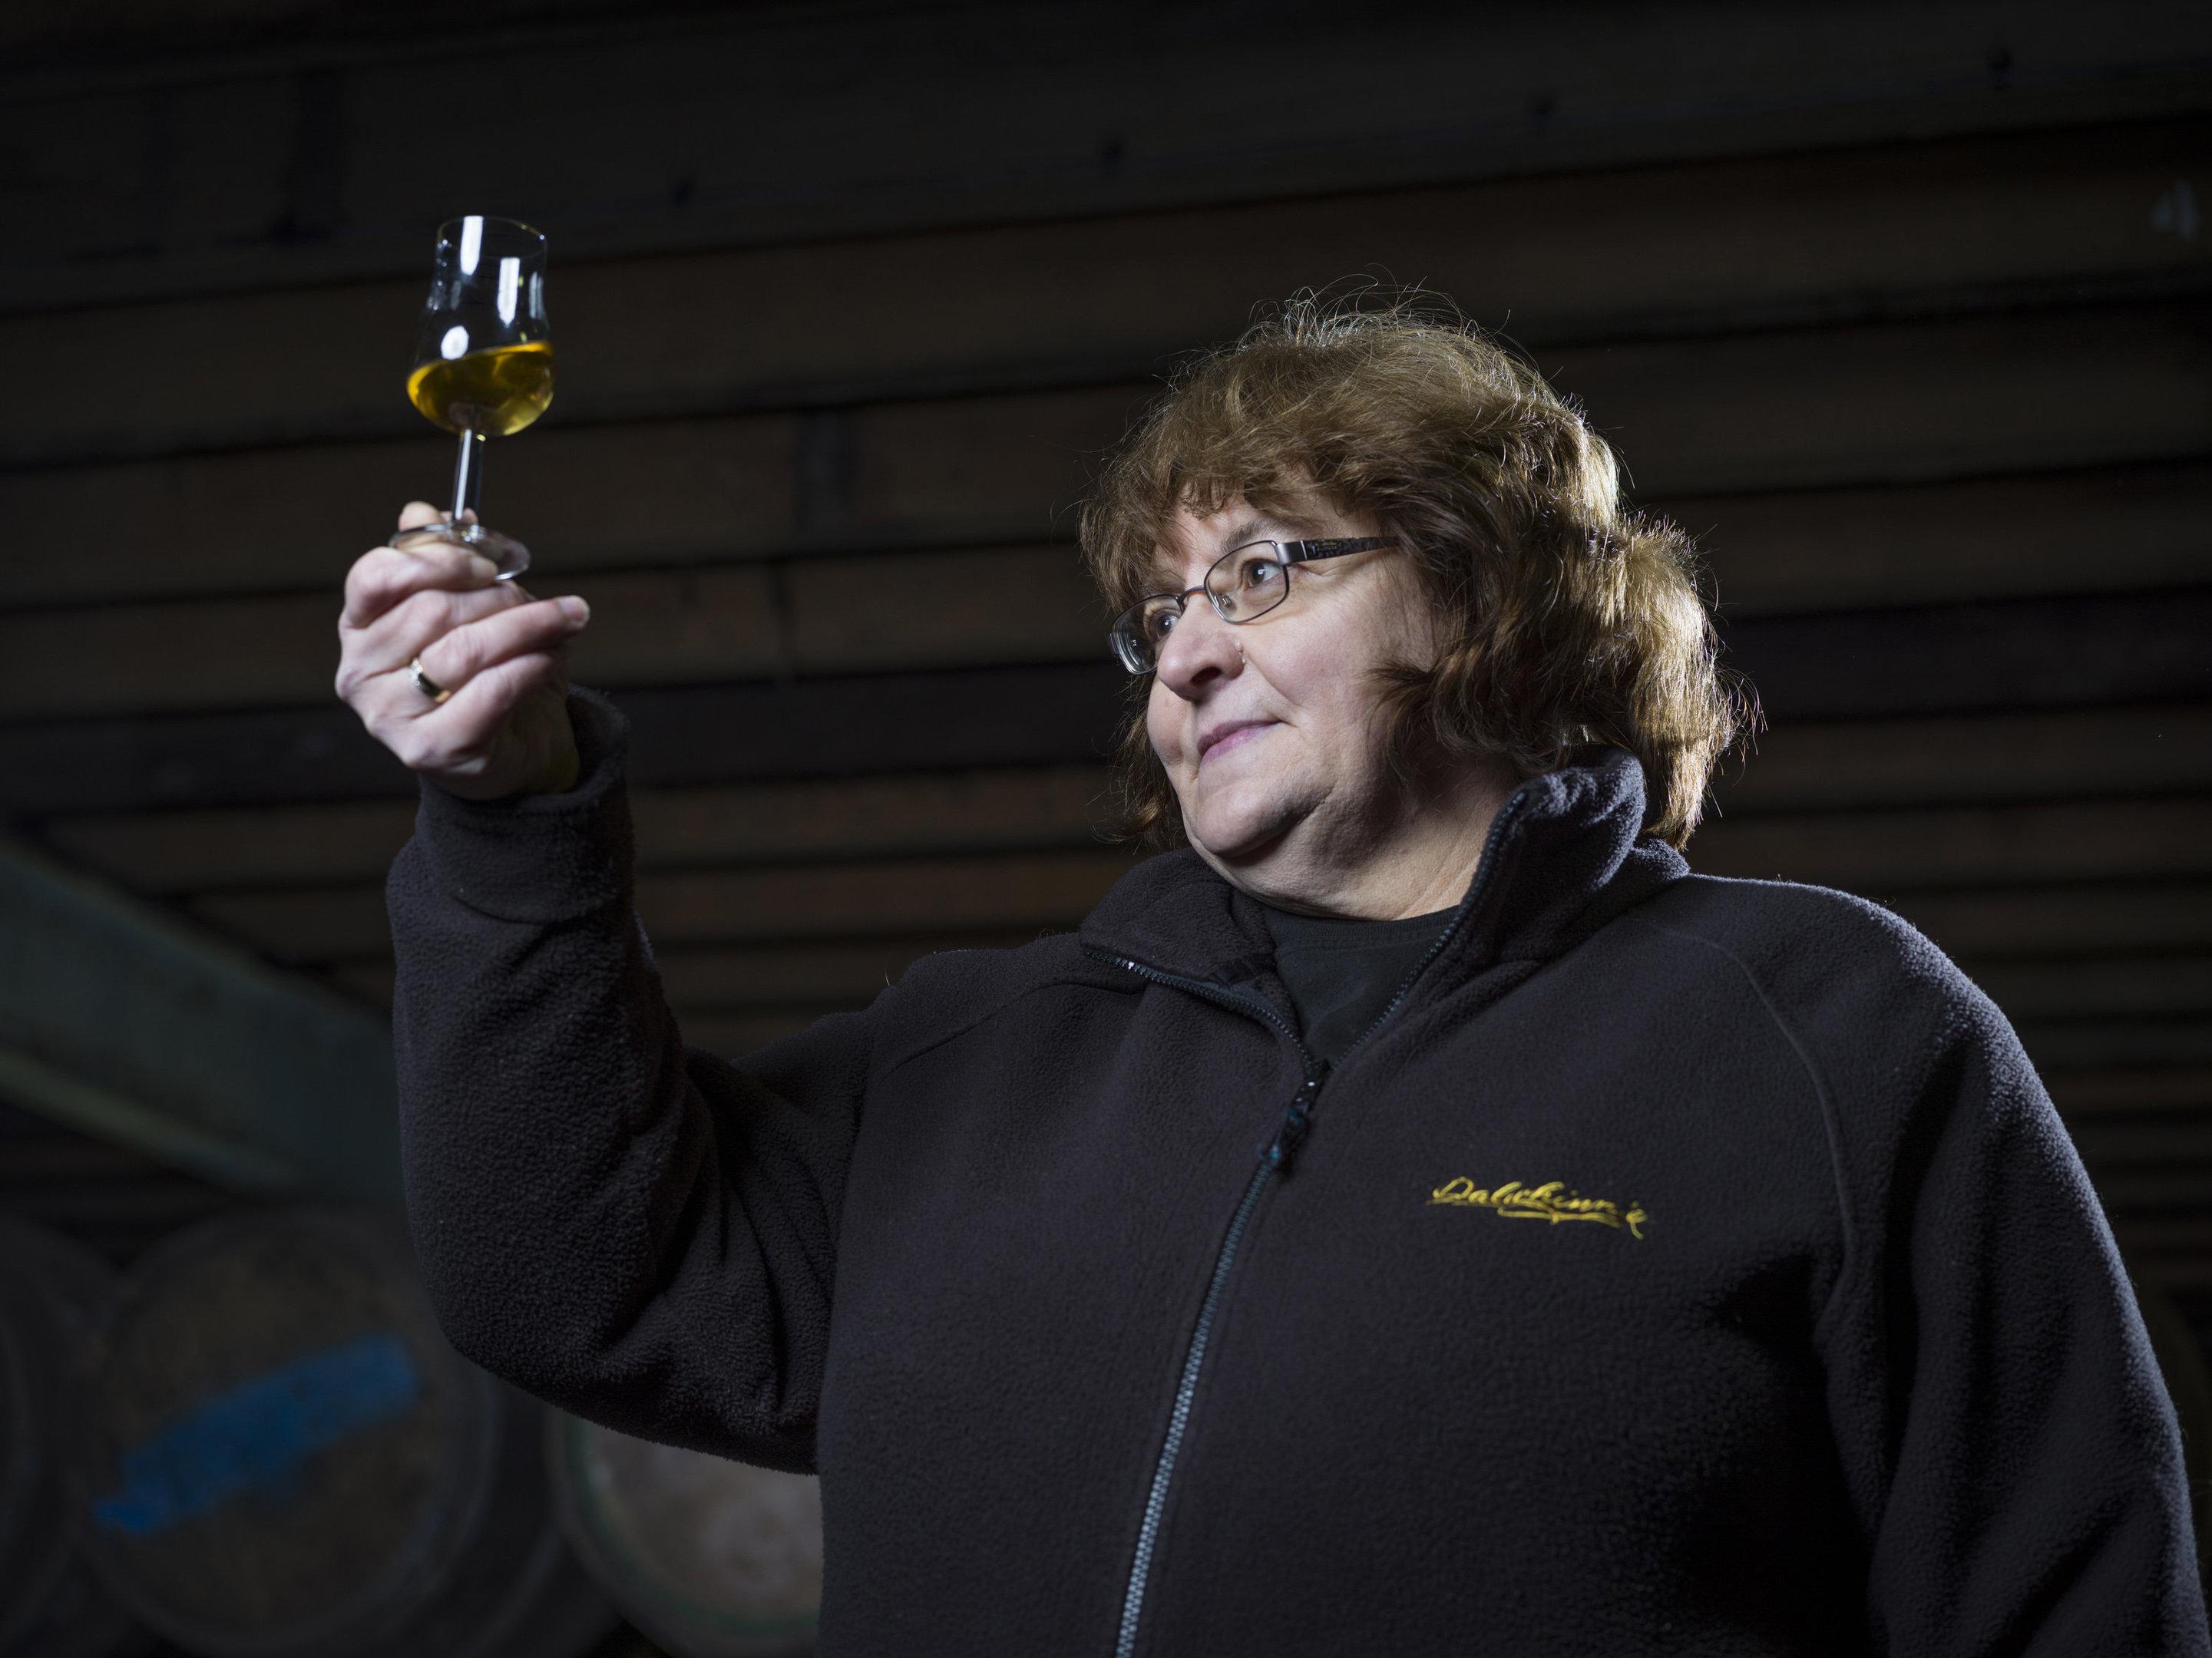 Whisky bosses have toasted Scotland's first female malt distiller